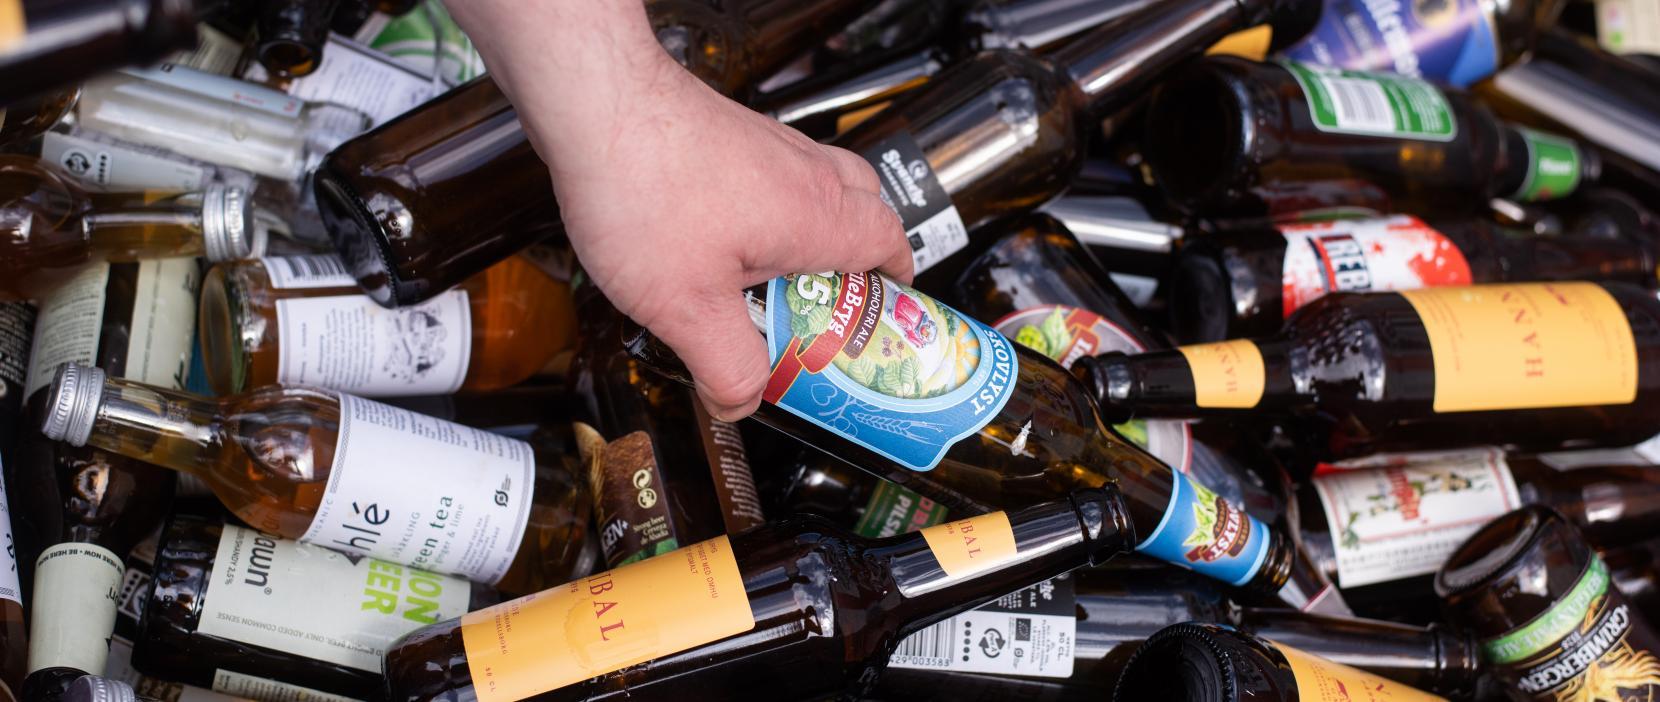 Holte Midtpunkt har fokus på affaldssortering